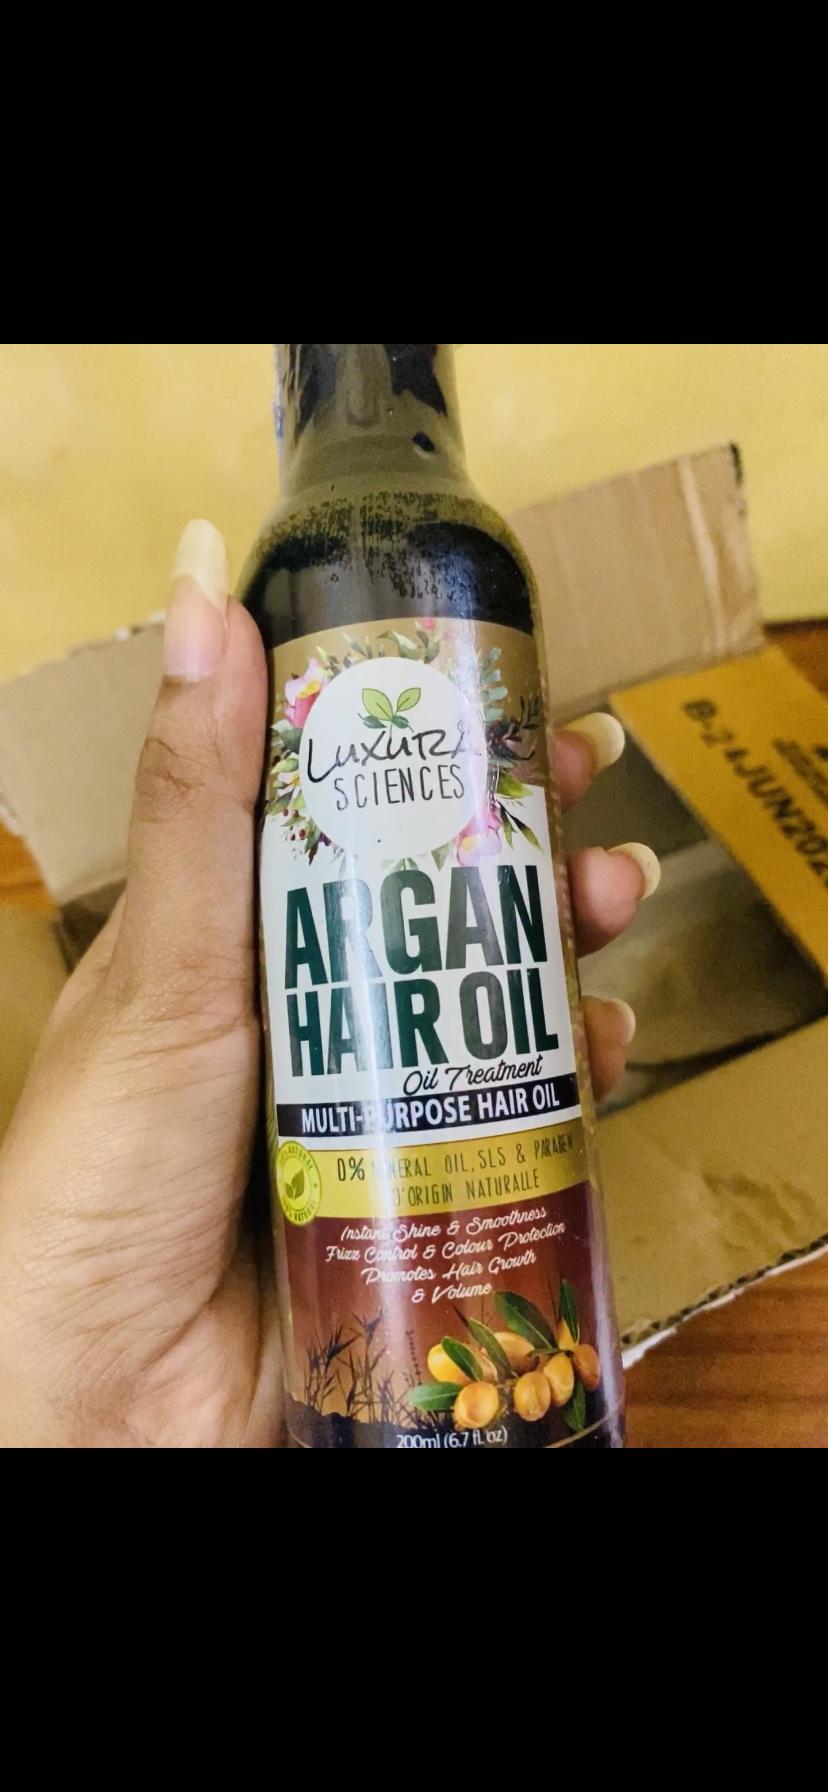 Luxura Sciences Argan Hair Oil 200 ml-Totally satisfied-By piyachandra3